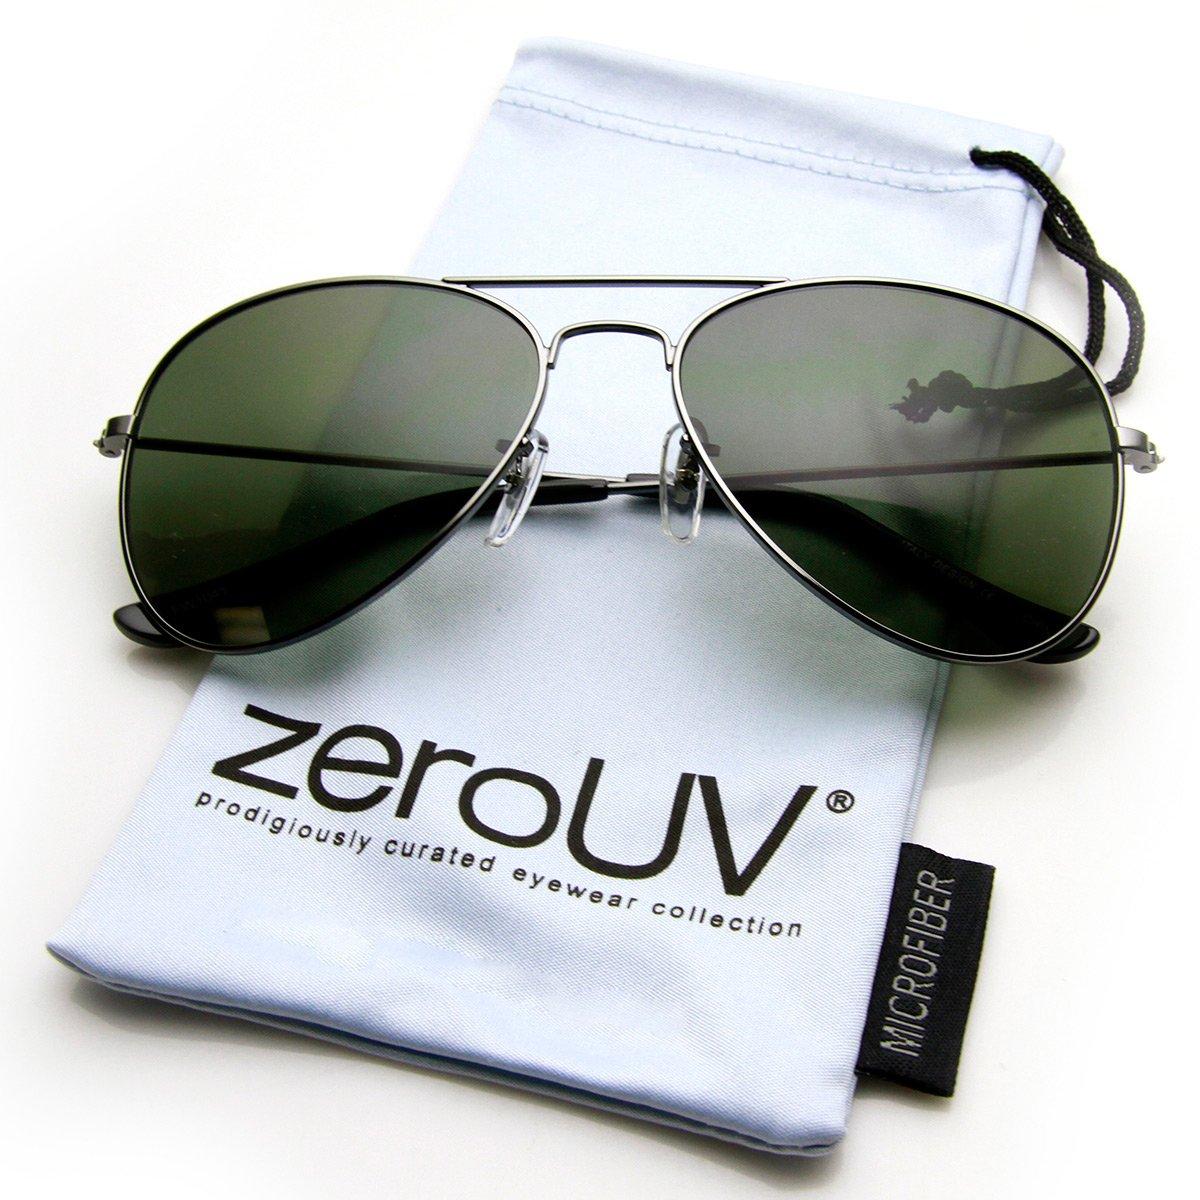 3594d6d22 Amazon.com: Original Classic Metal Standard Aviator Sunglasses - Nickel  Plated Frame (3-Pack (Gold/Silver/Gunmetal)): Clothing